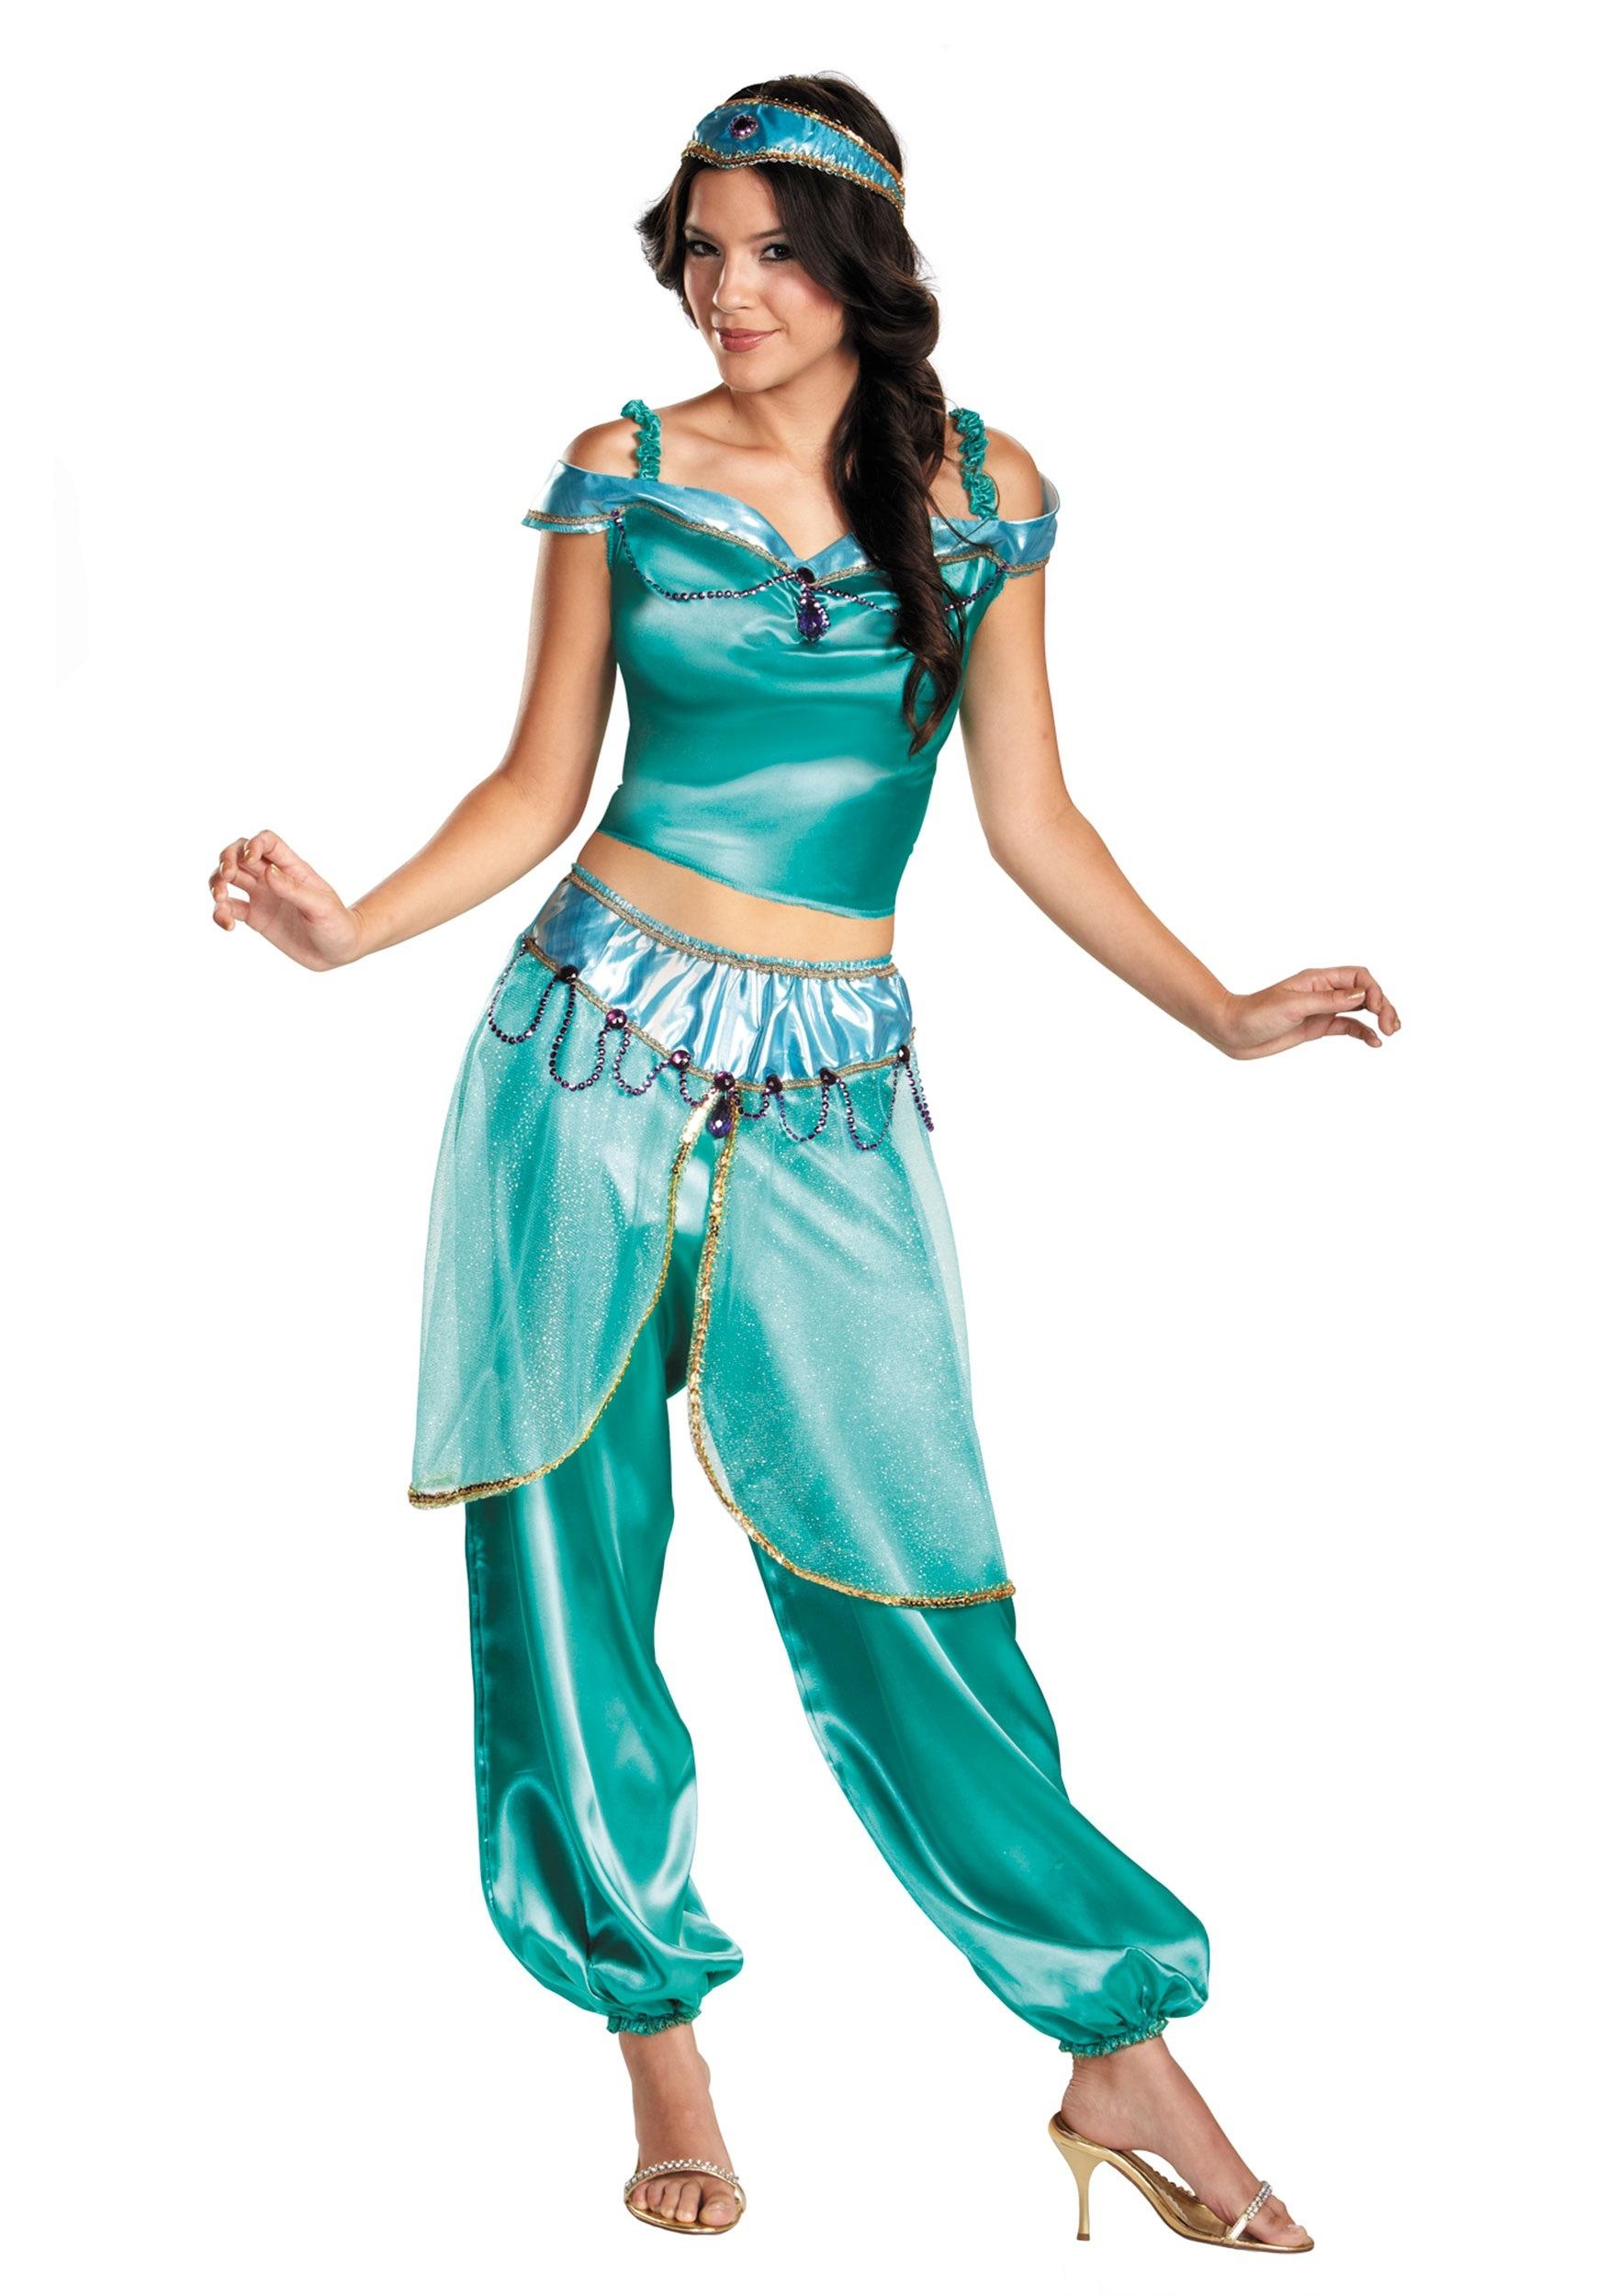 Womenu0027s Princess Jasmine Costume  sc 1 st  Fun.com & Princess Jasmine Womenu0027s Costume from Aladdin